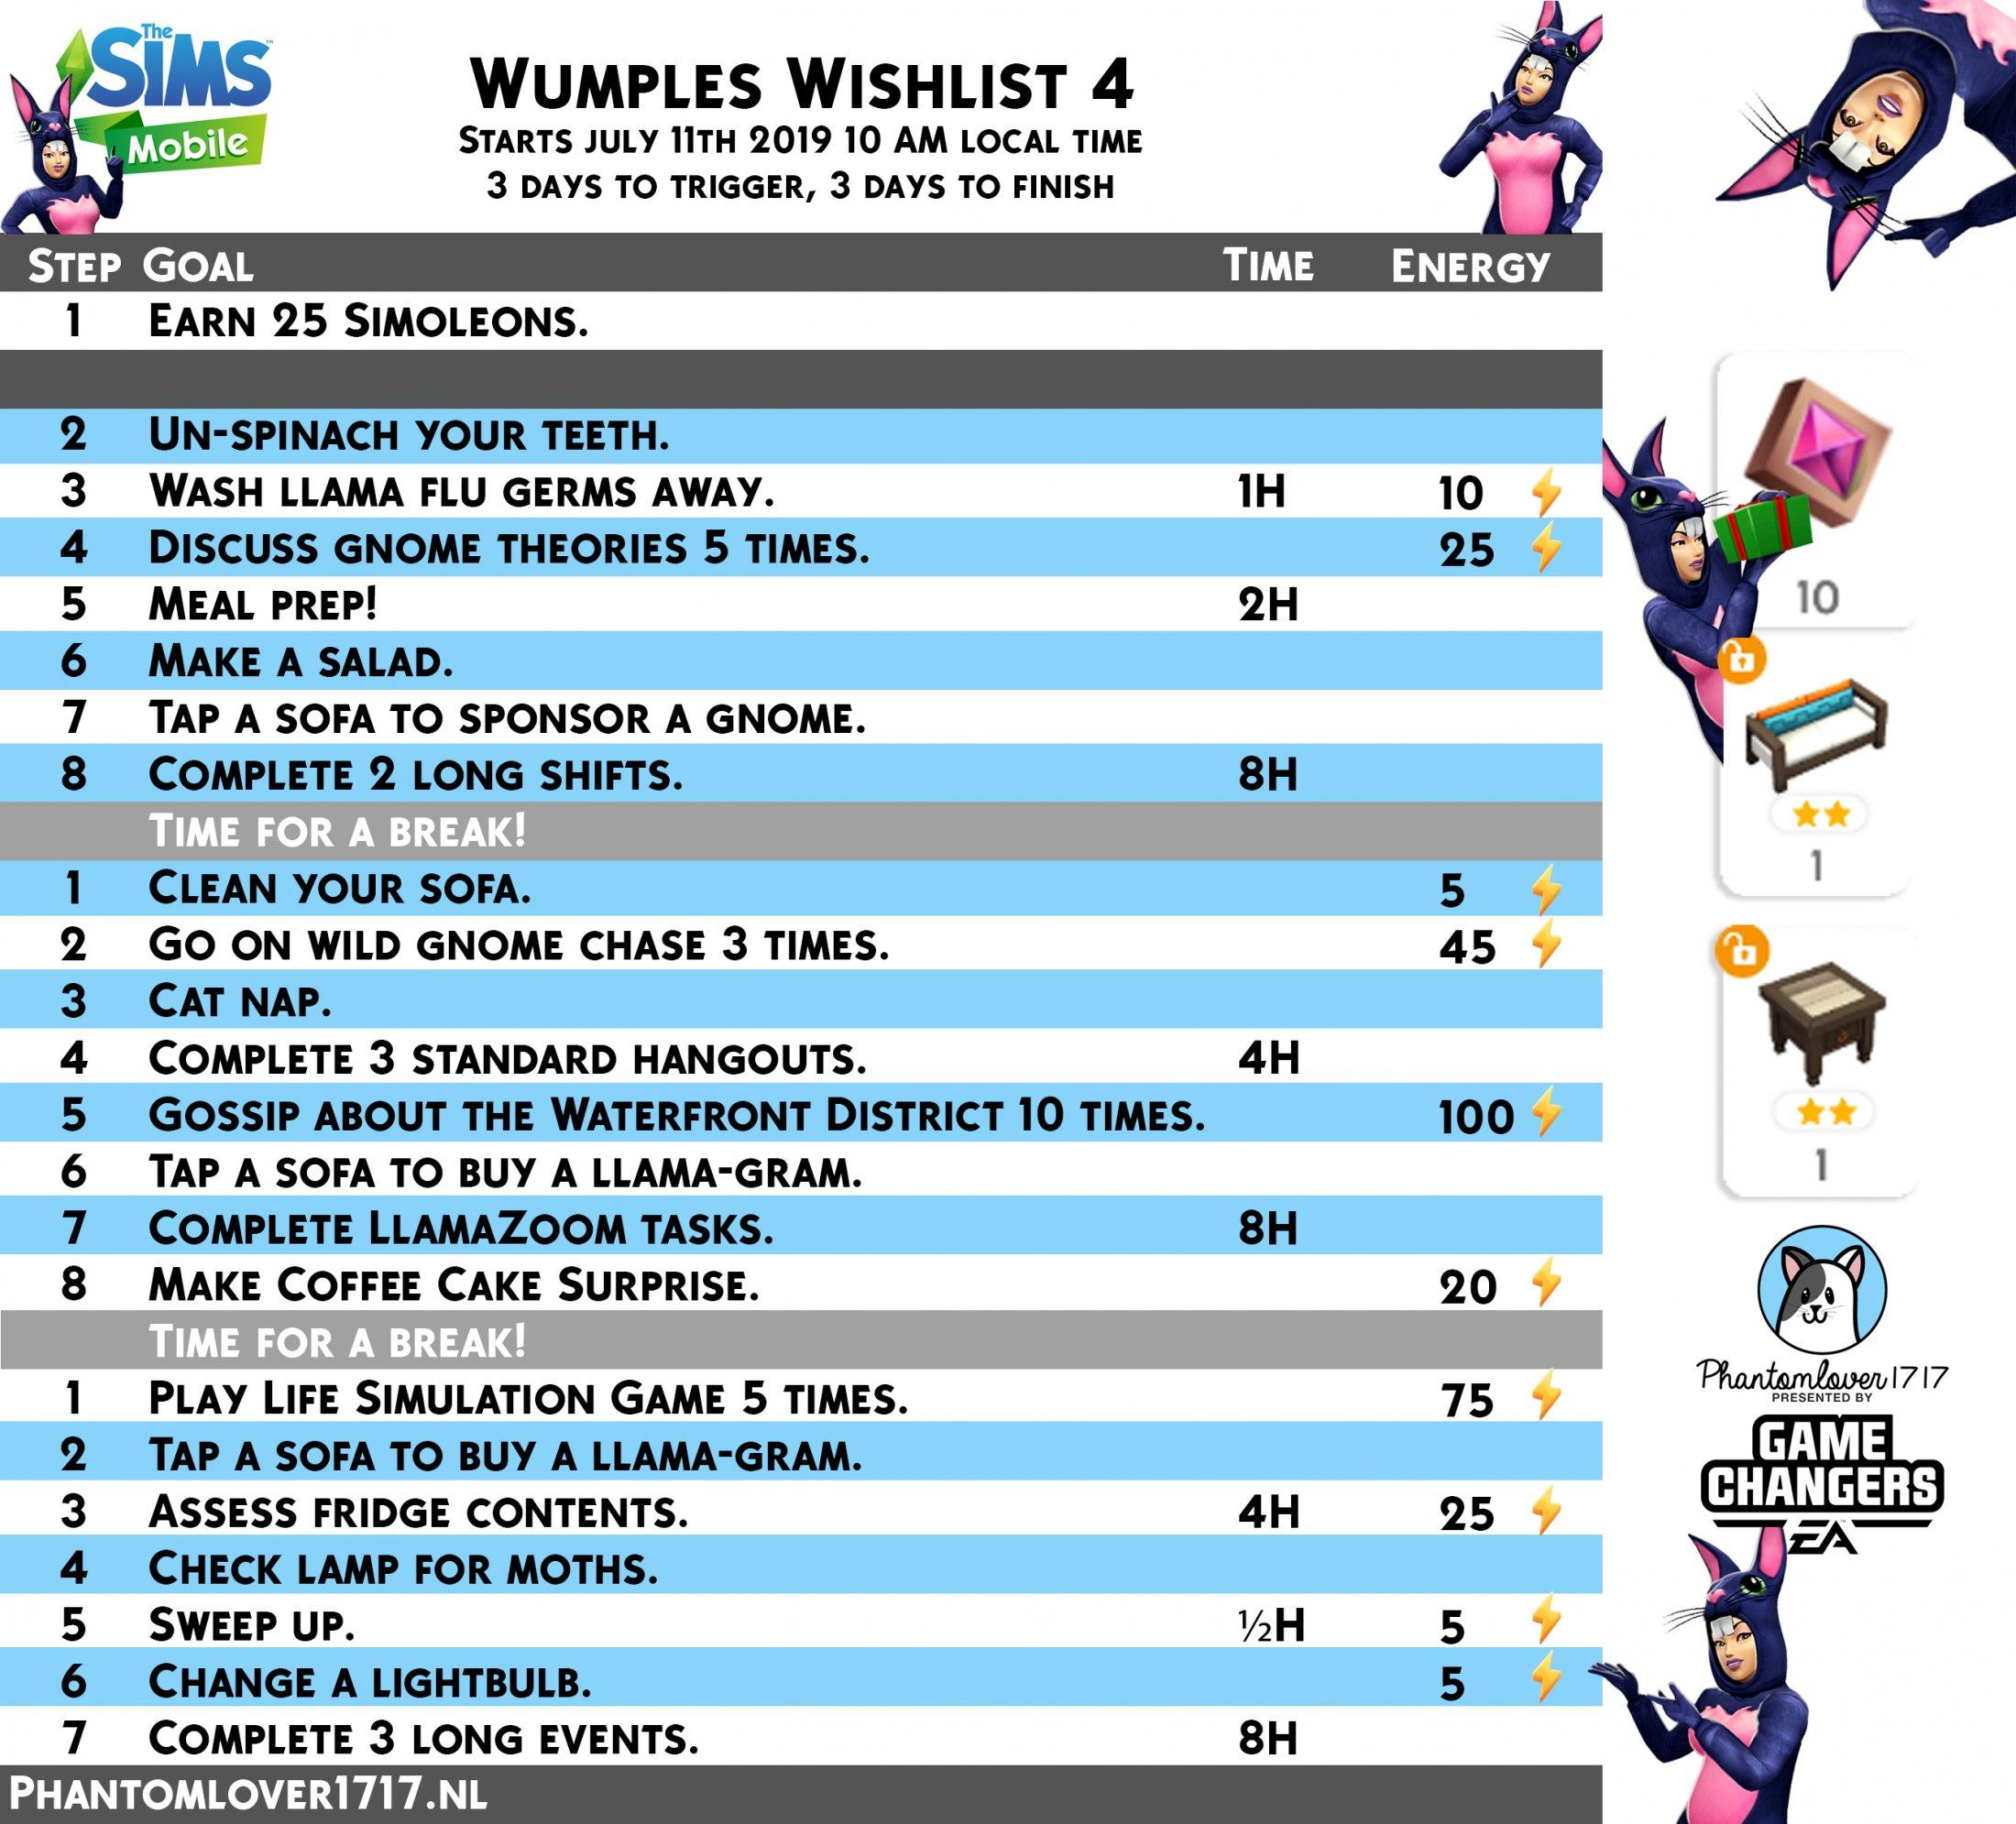 Wumples Wishlist 4